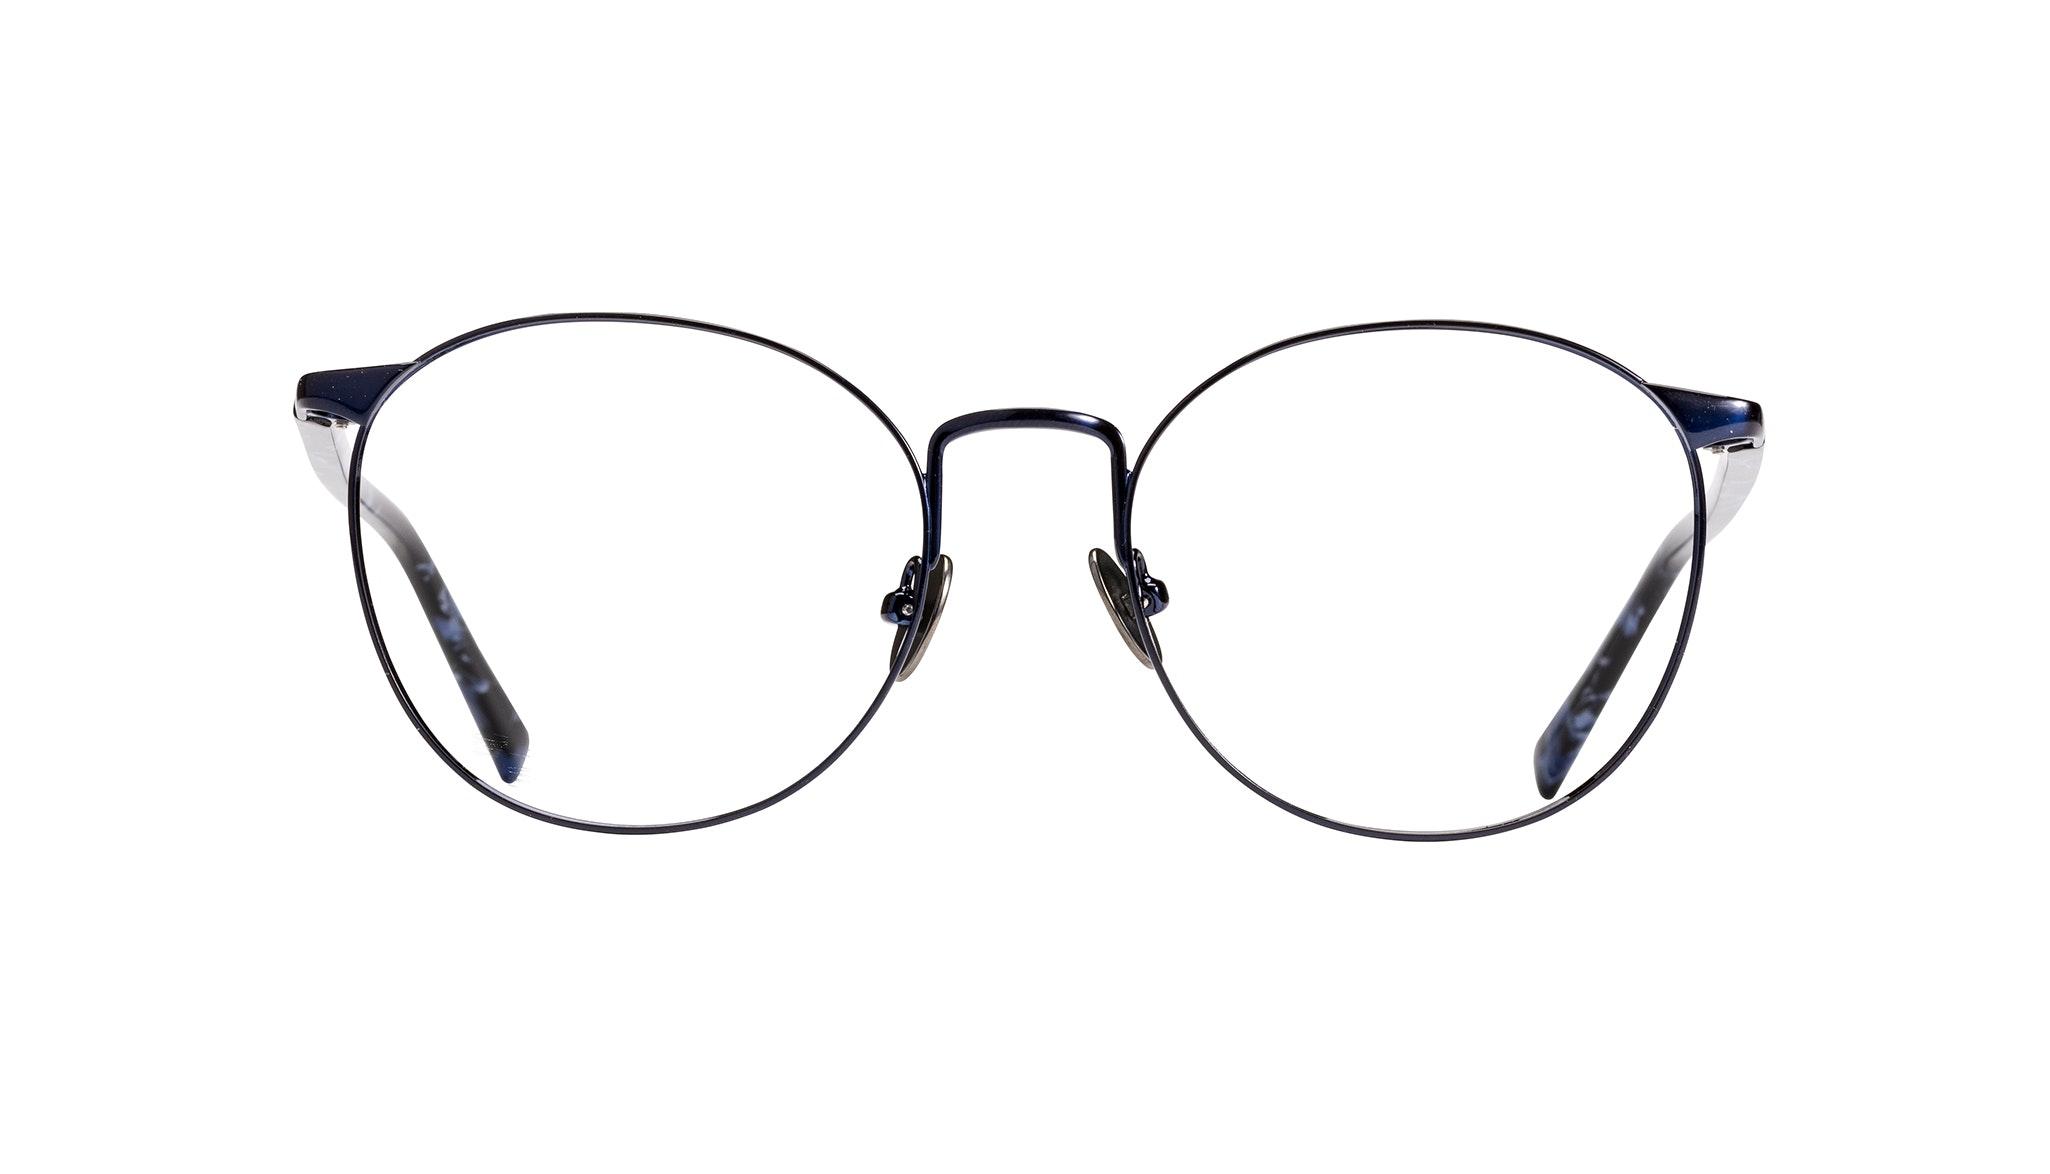 Affordable Fashion Glasses Round Eyeglasses Women Romy Penombre